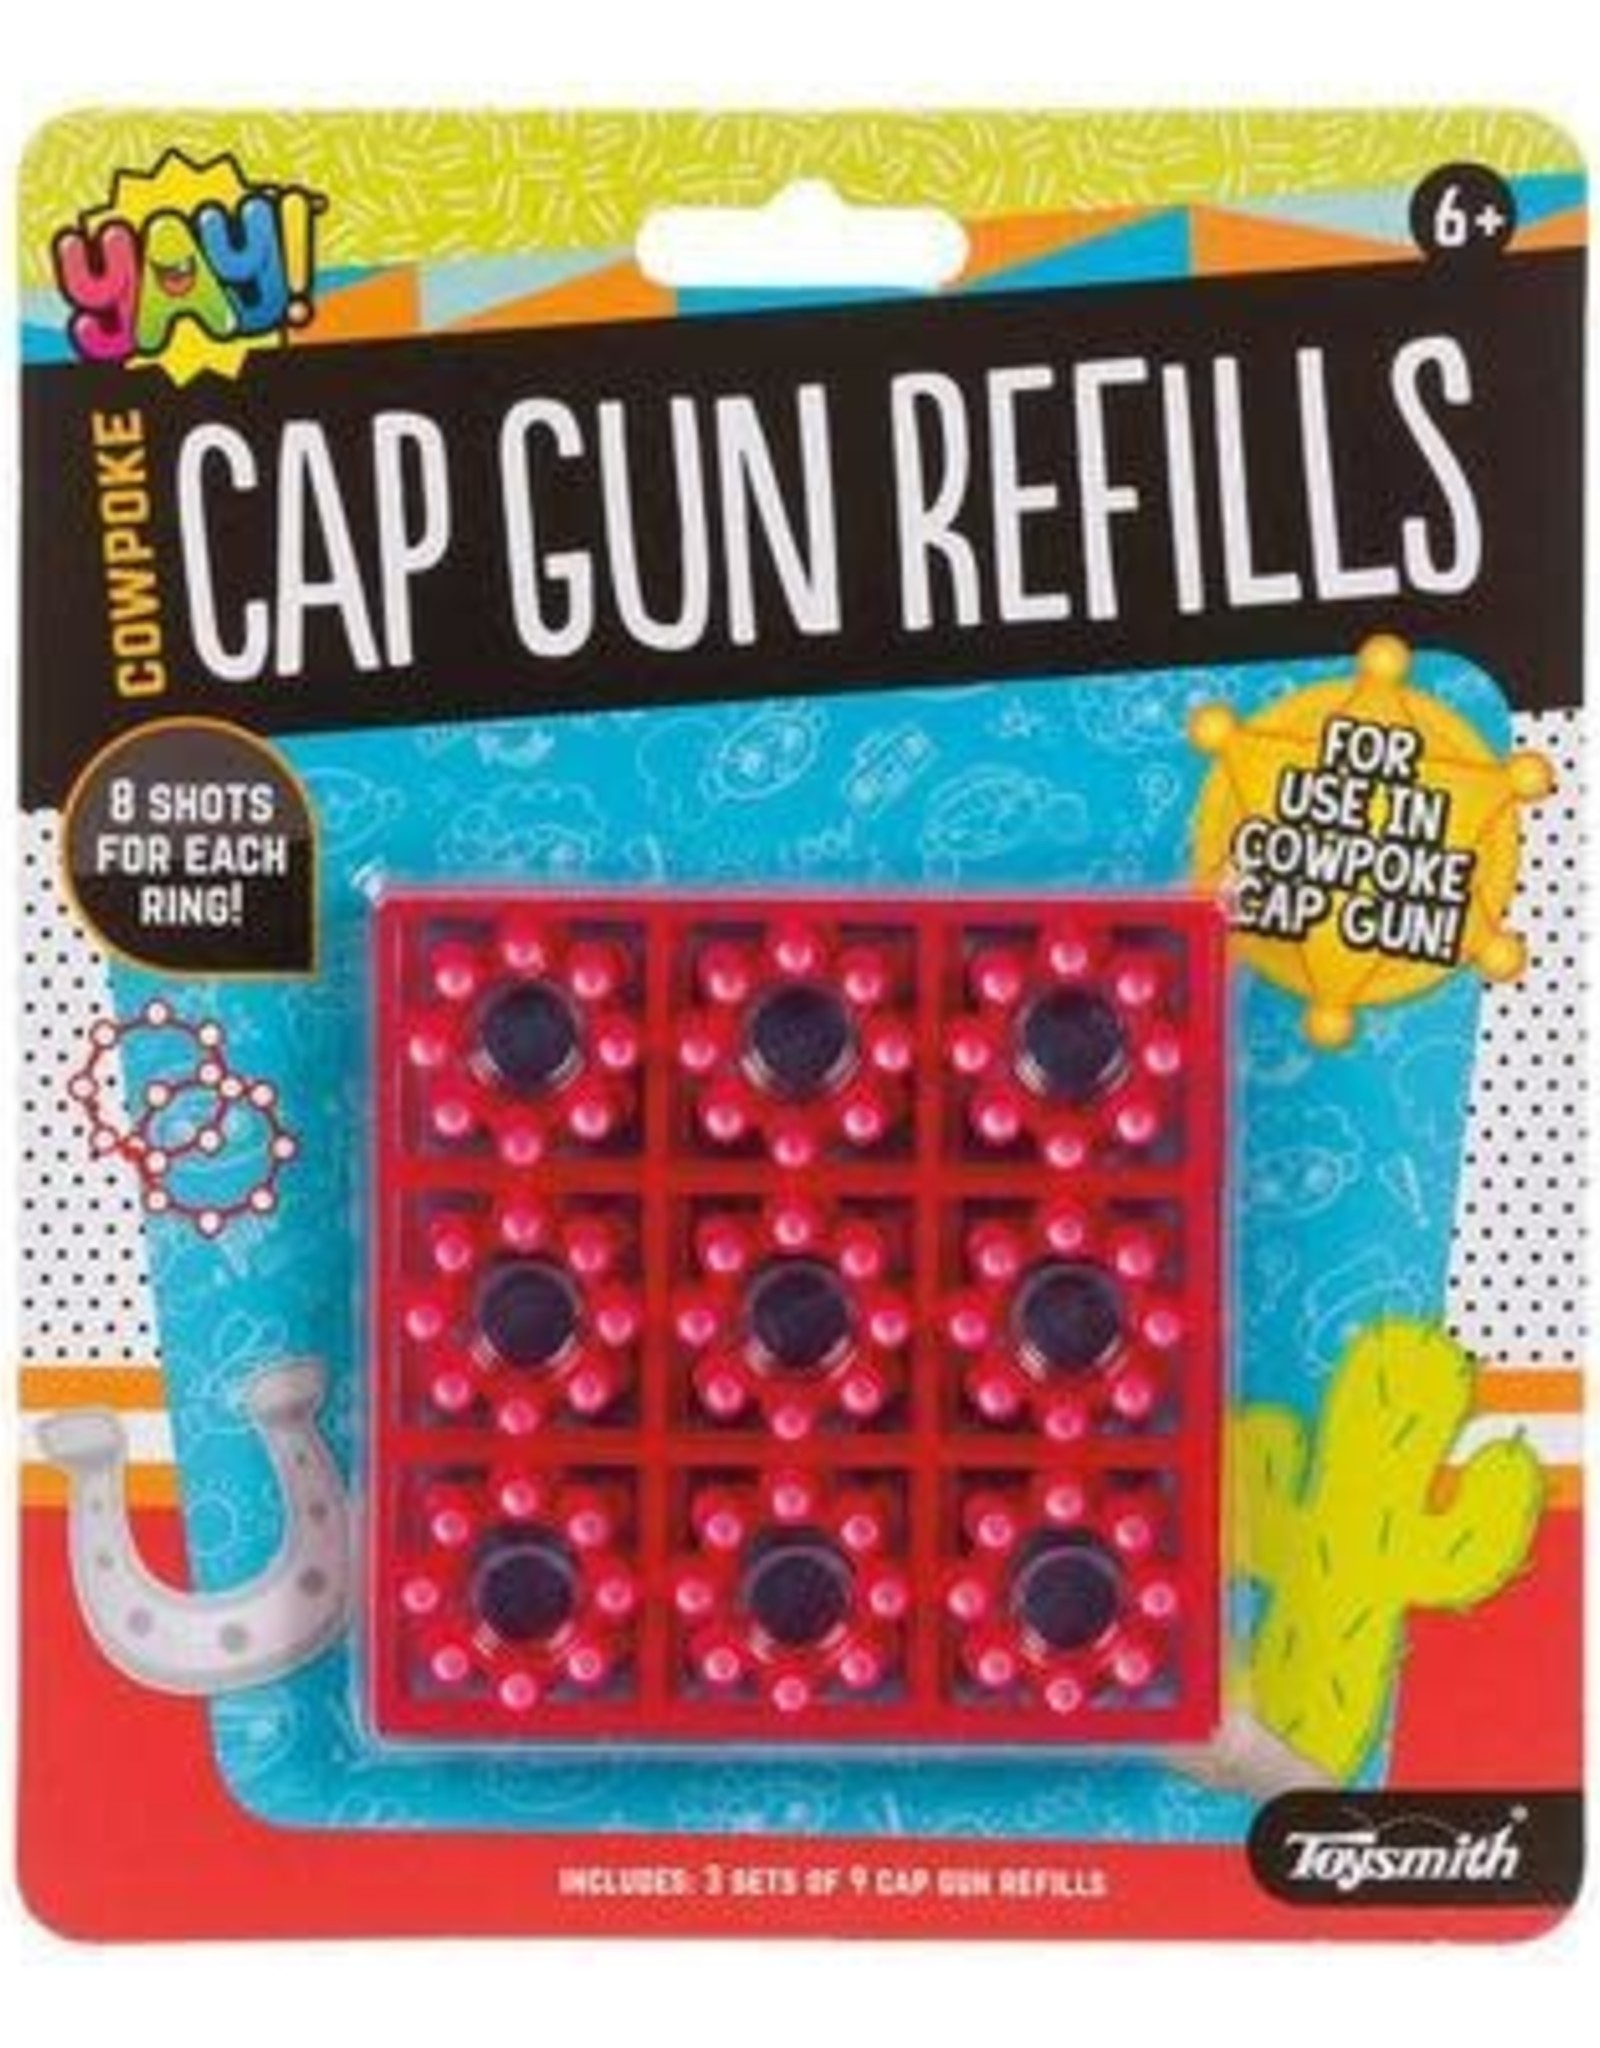 Cap Gun Refills